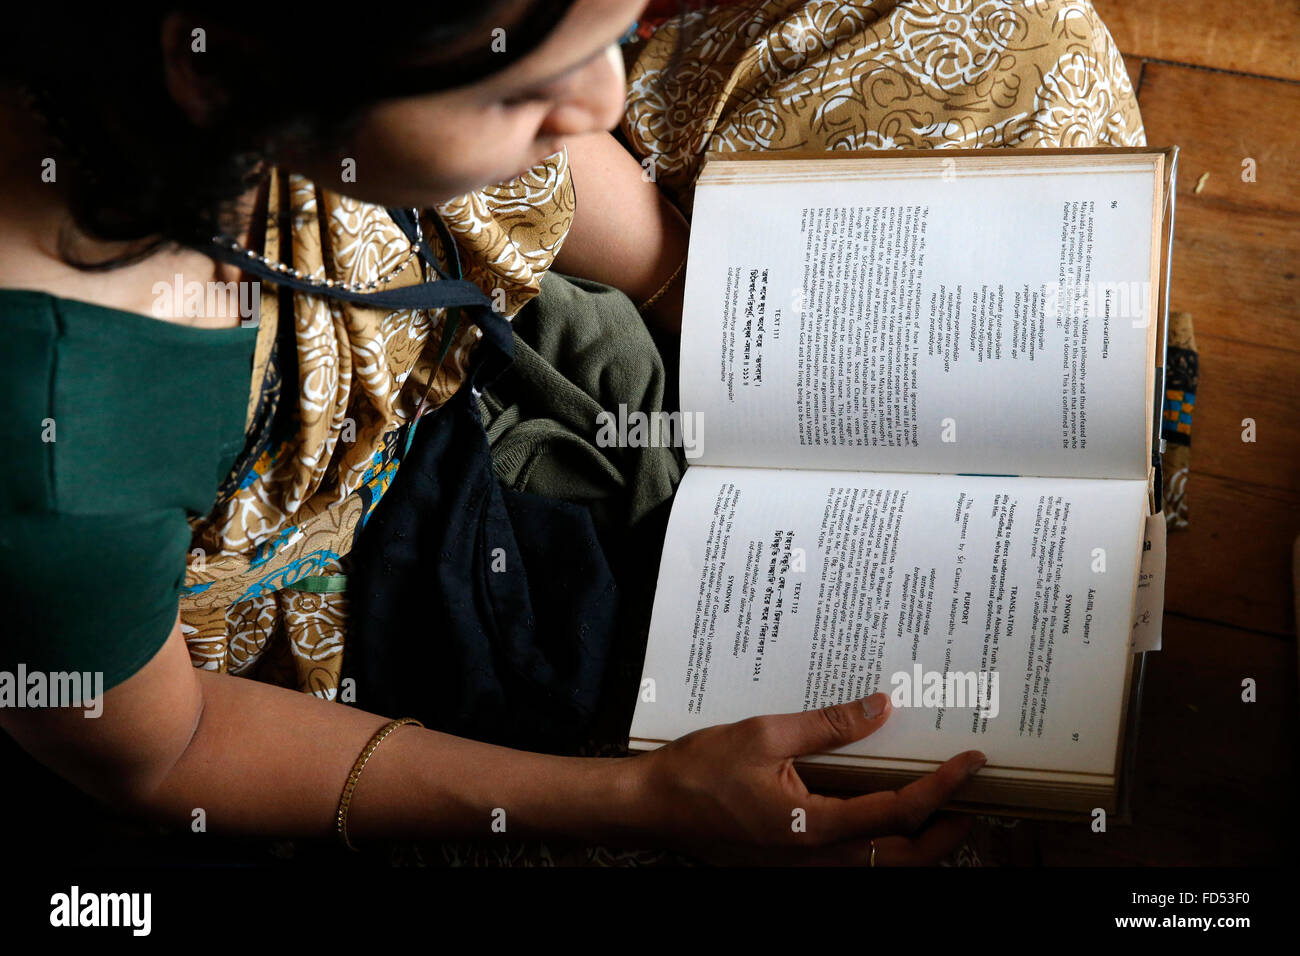 Woman reading the Bhagavad Gita - Stock Image